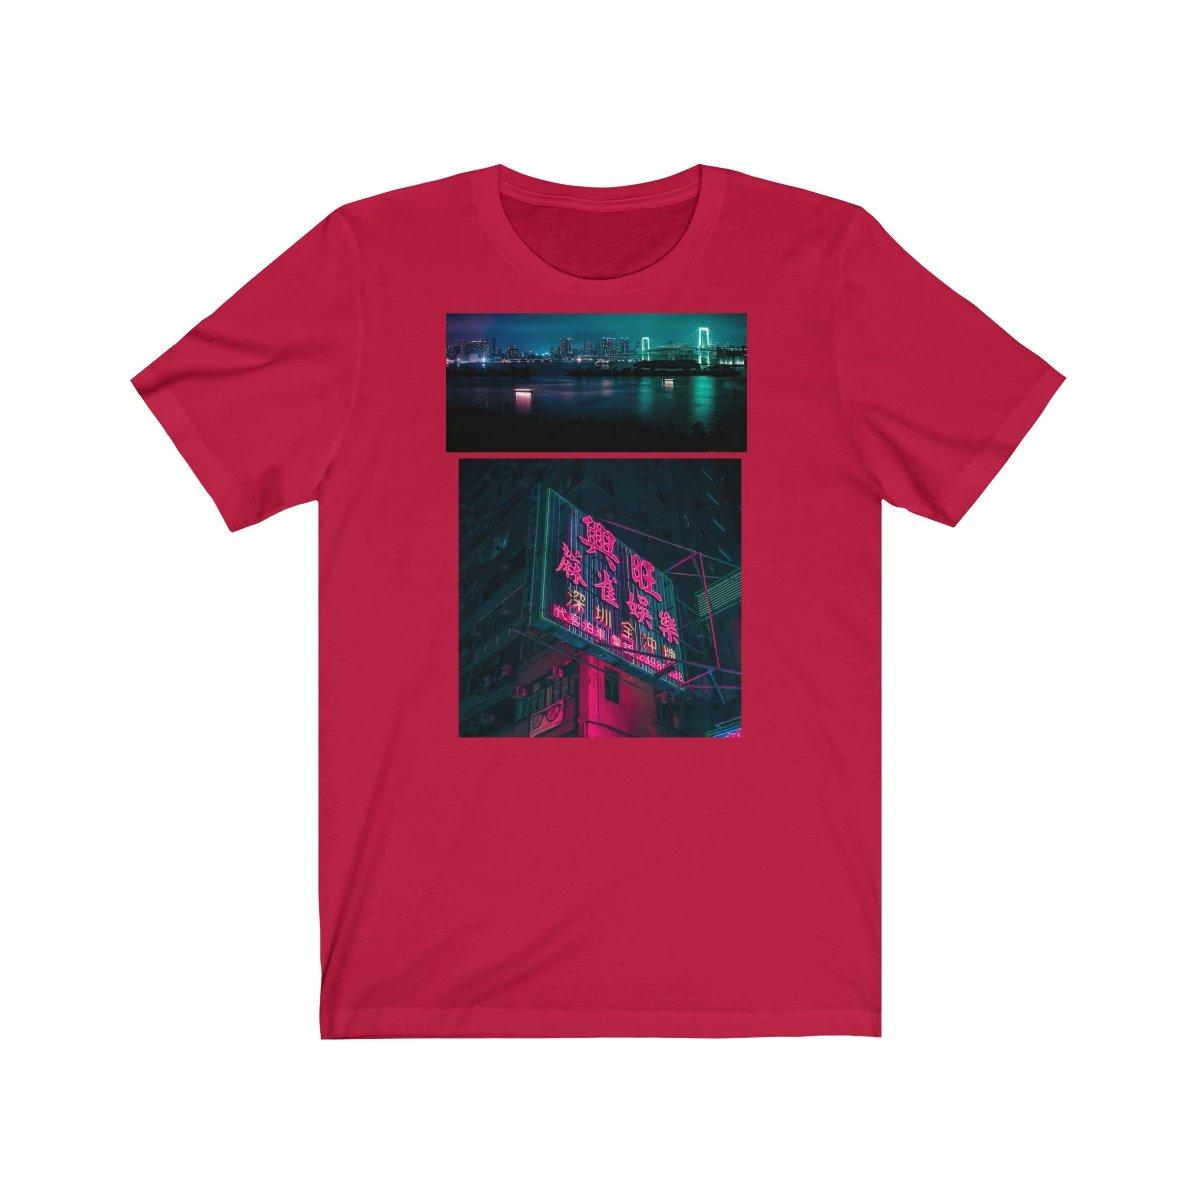 #Digitalprint #shirts #sportswear #activewear #swimmingwear #gymwear #cyclingwear #usa #nz #Hamzacloth #outerwear #streetwear #clothespic.twitter.com/5EKgOLLFJV